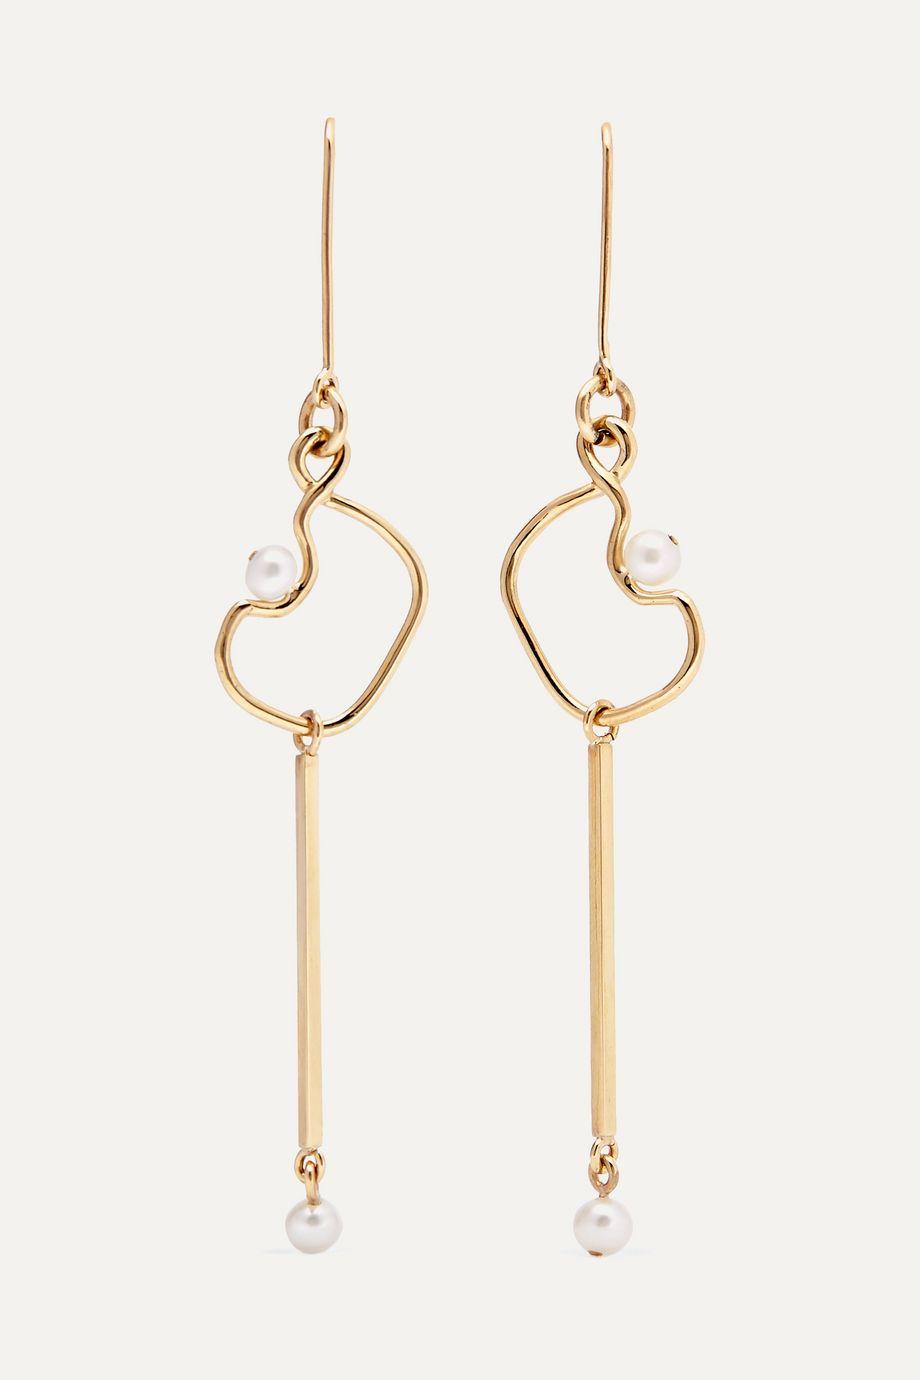 Meadowlark Clio 9-karat gold pearl earrings